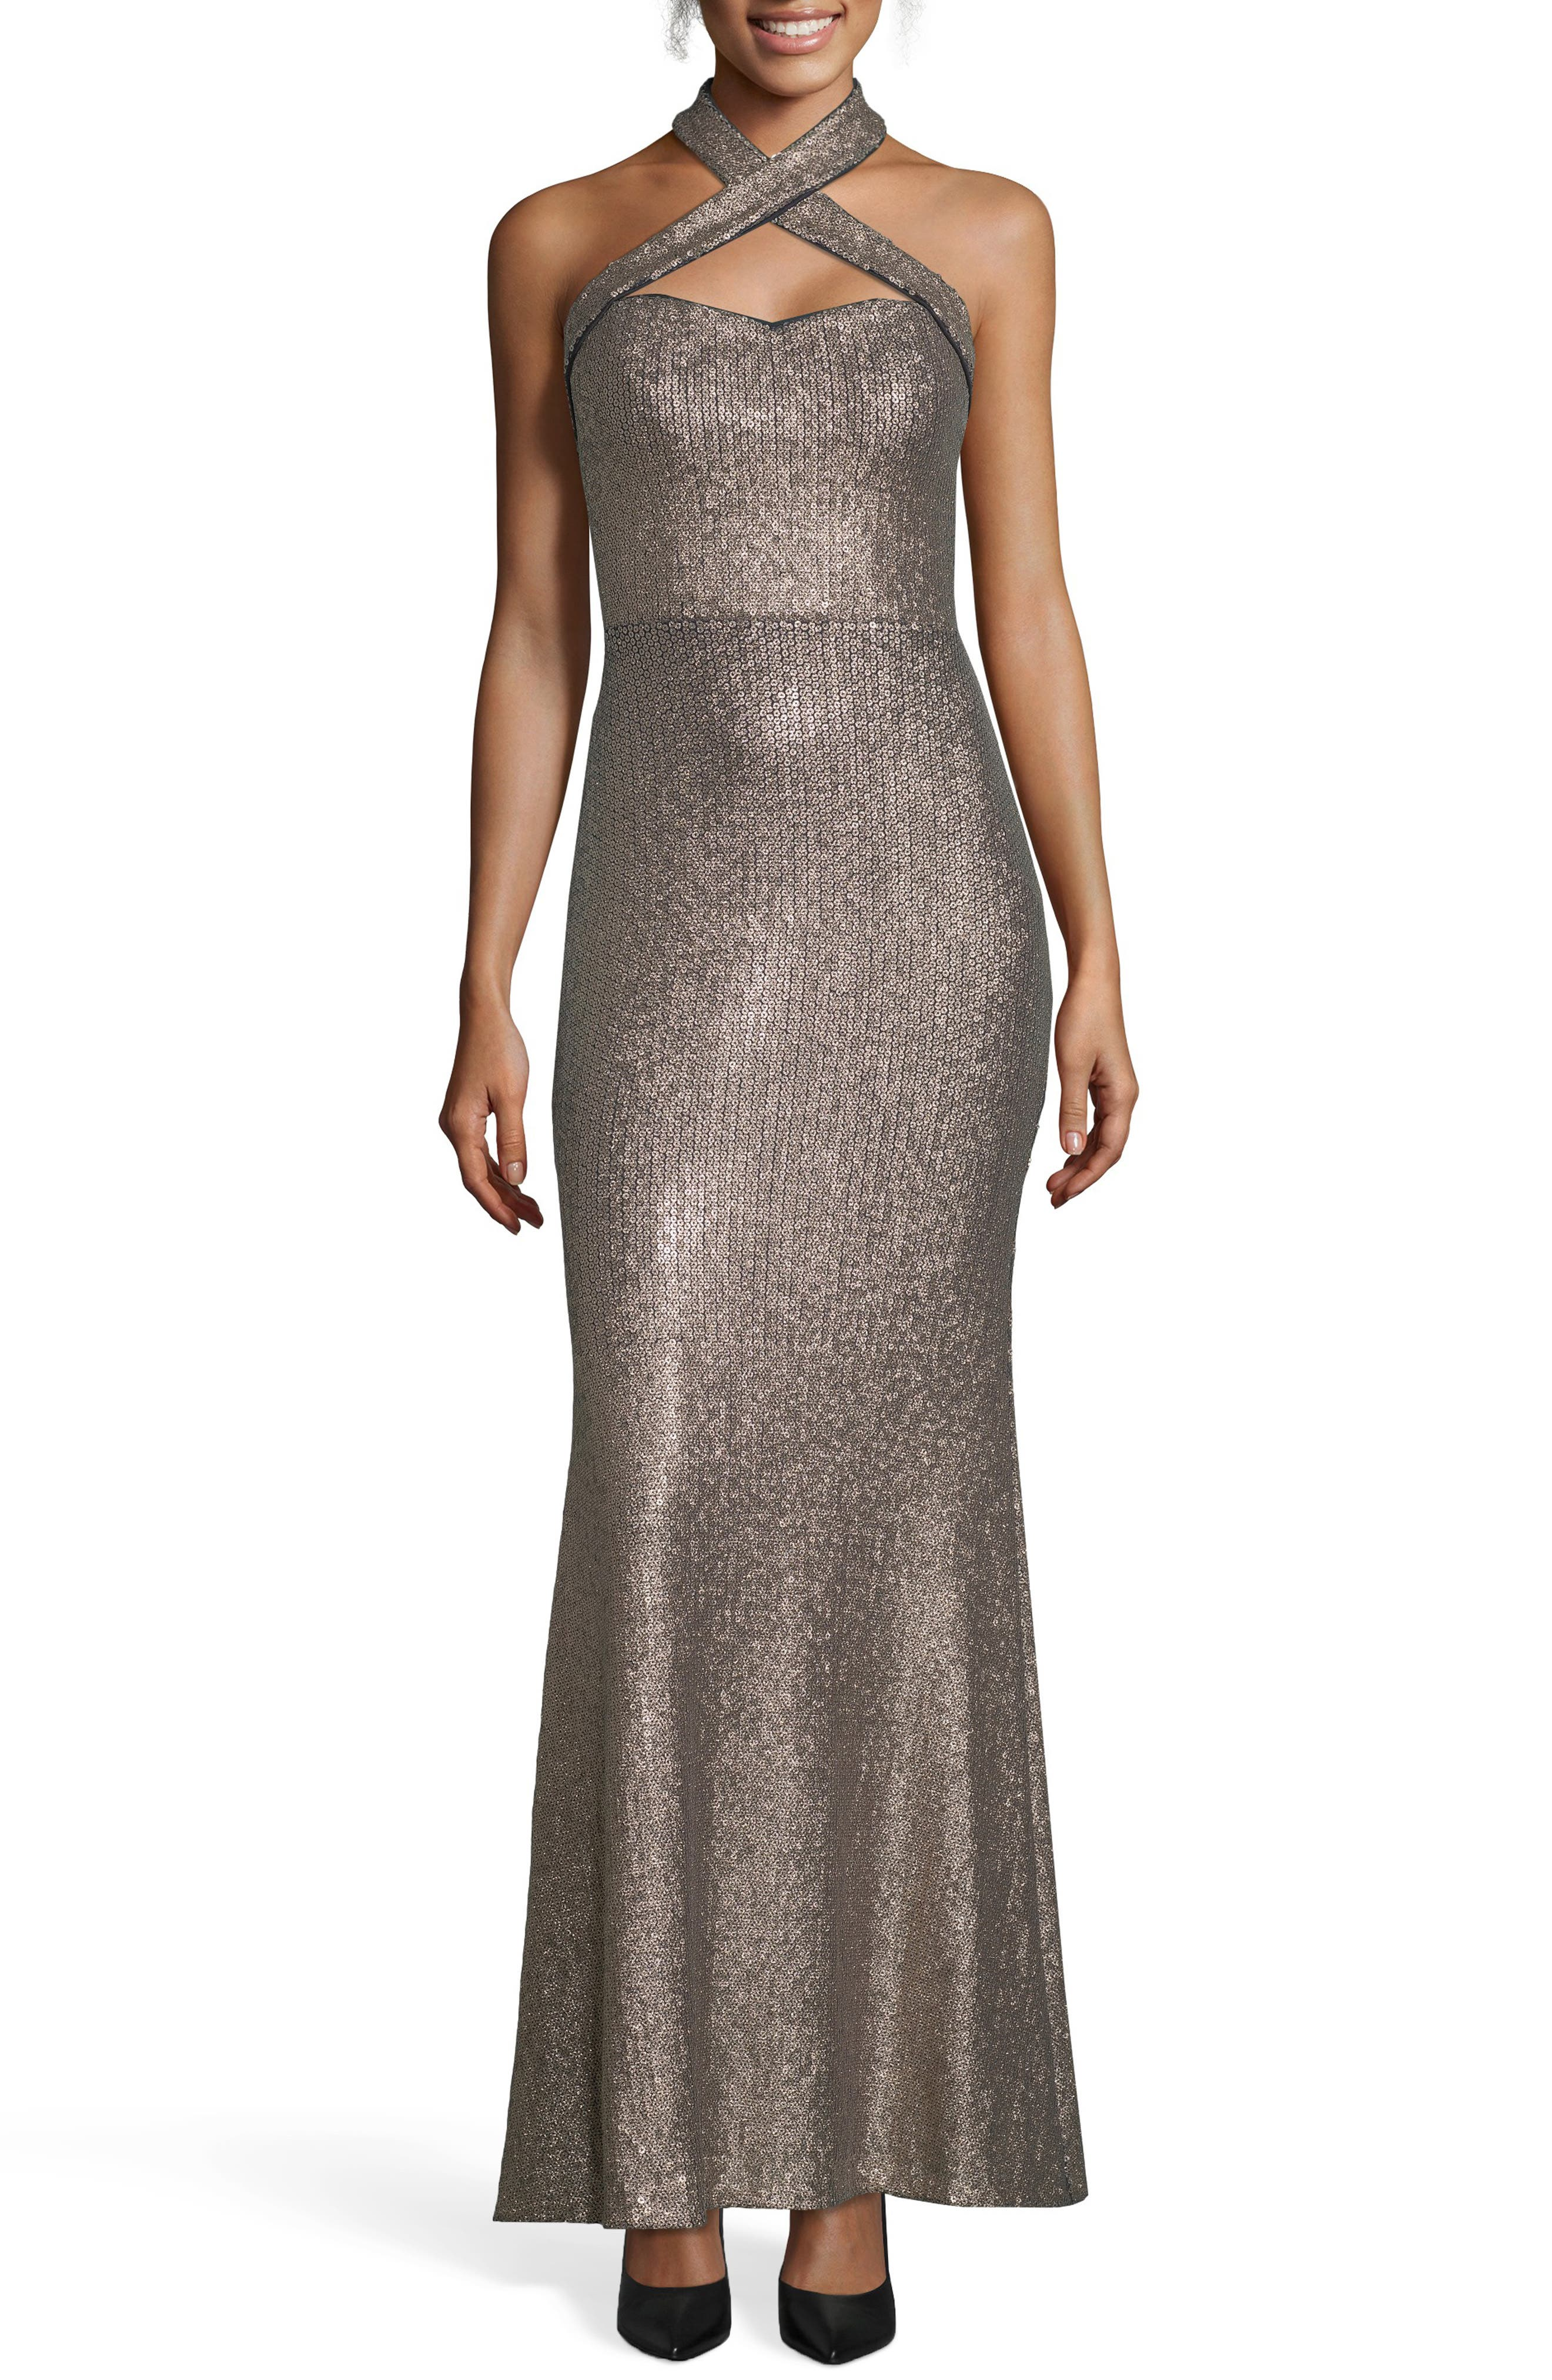 Crisscross Halter Neck Sequin Gown,                         Main,                         color, GOLD/ NAVY